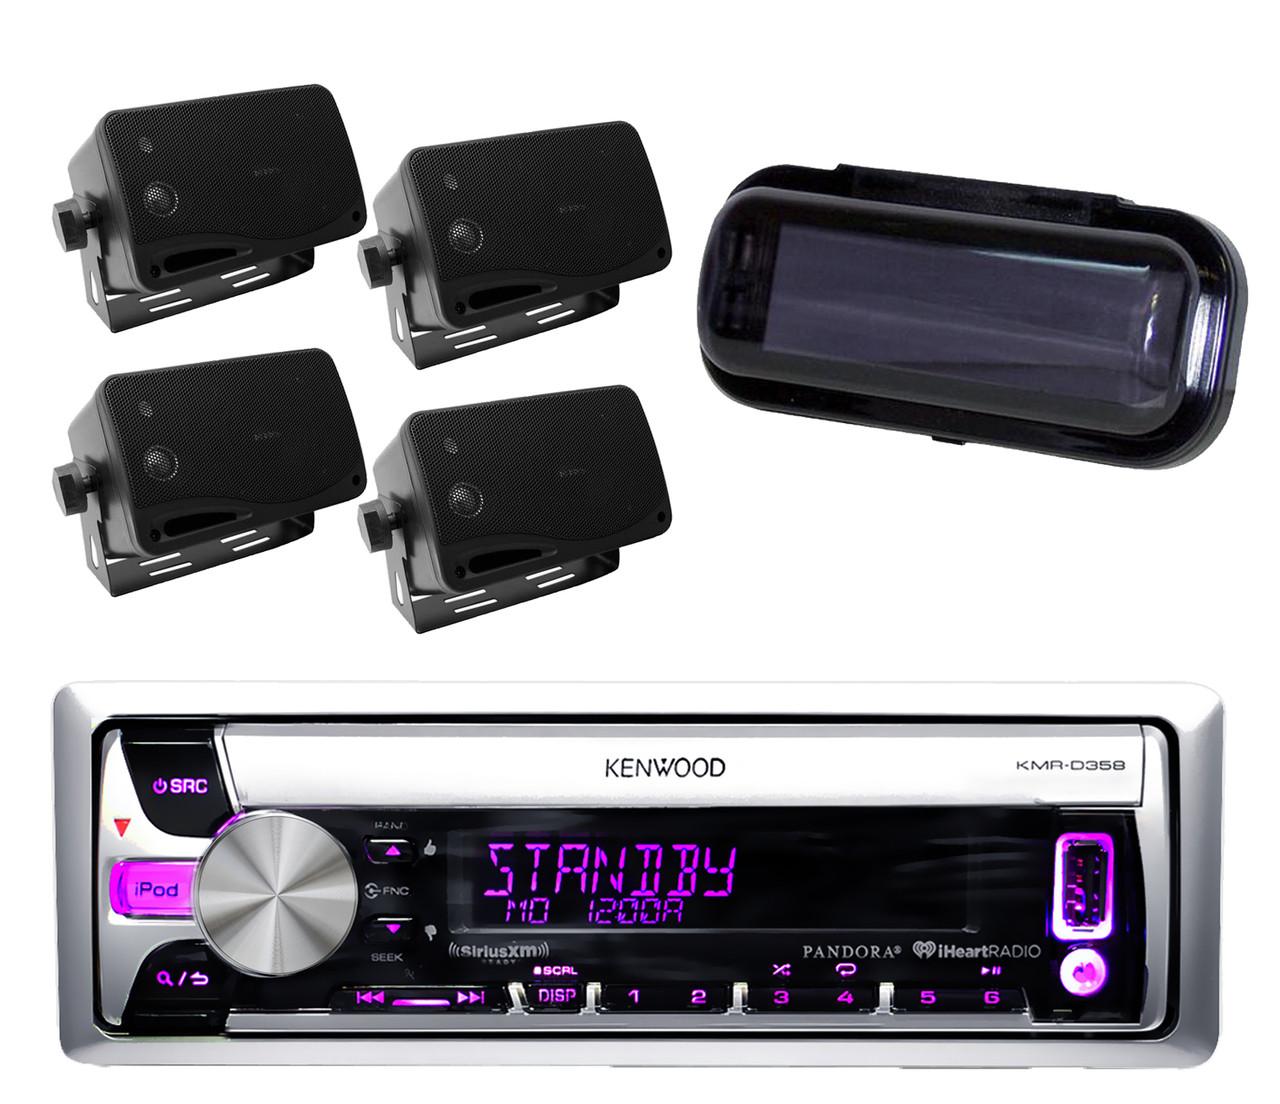 kenwood new kmr d358 iphone ipod pandora radio player 4 black box speakers  [ 1280 x 1104 Pixel ]